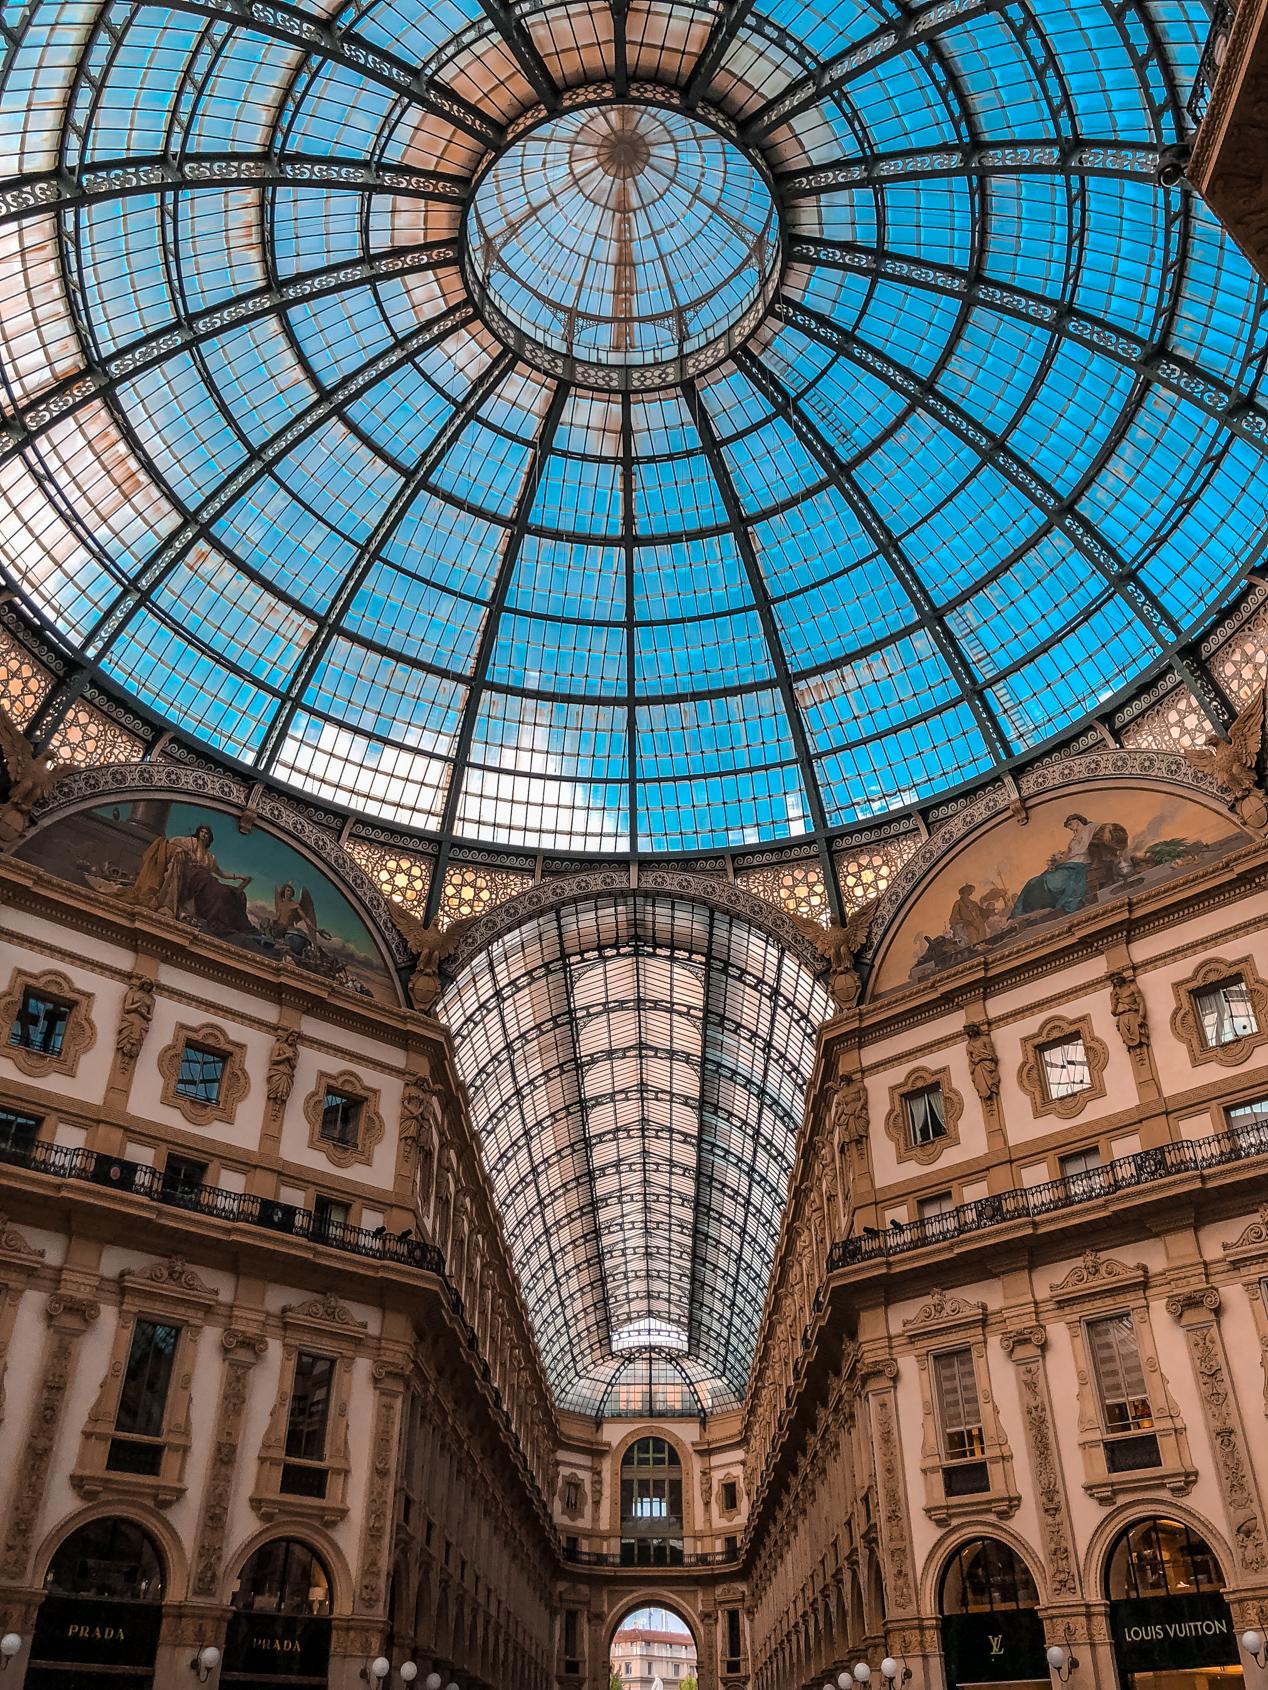 Traveldiary Milano, Reisebericht Mailand, Milan Travel, Reiseblogger, Tipps Mailand, Reisen, Travel, Must Sees in Mailand, Insider Tipps, Italien,_-11